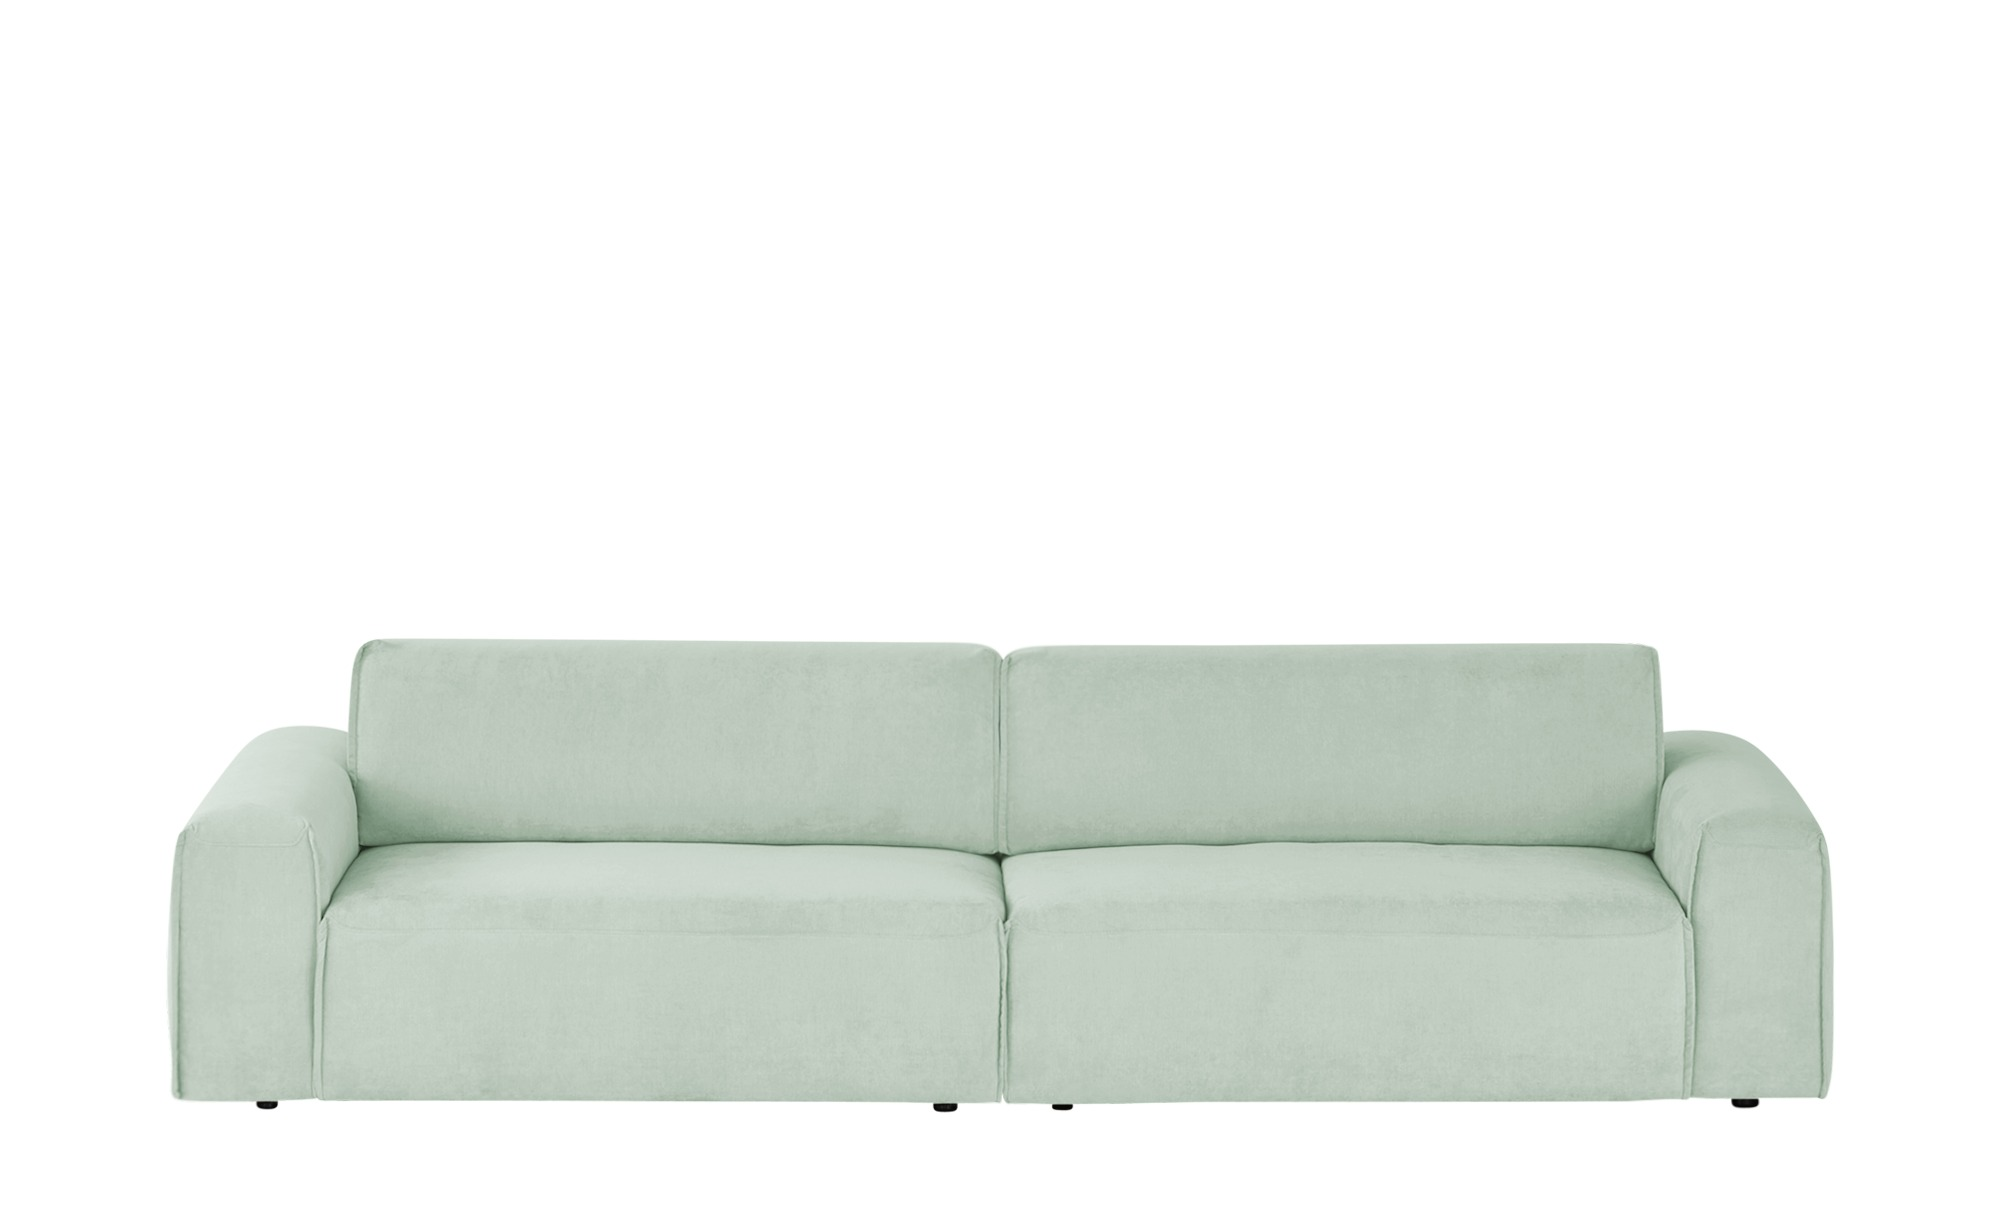 Max Schelling Big Sofa  Life ¦ grün ¦ Maße (cm): B: 296 T: 120 Polstermöbel > Sofas > Big-Sofas - Höffner